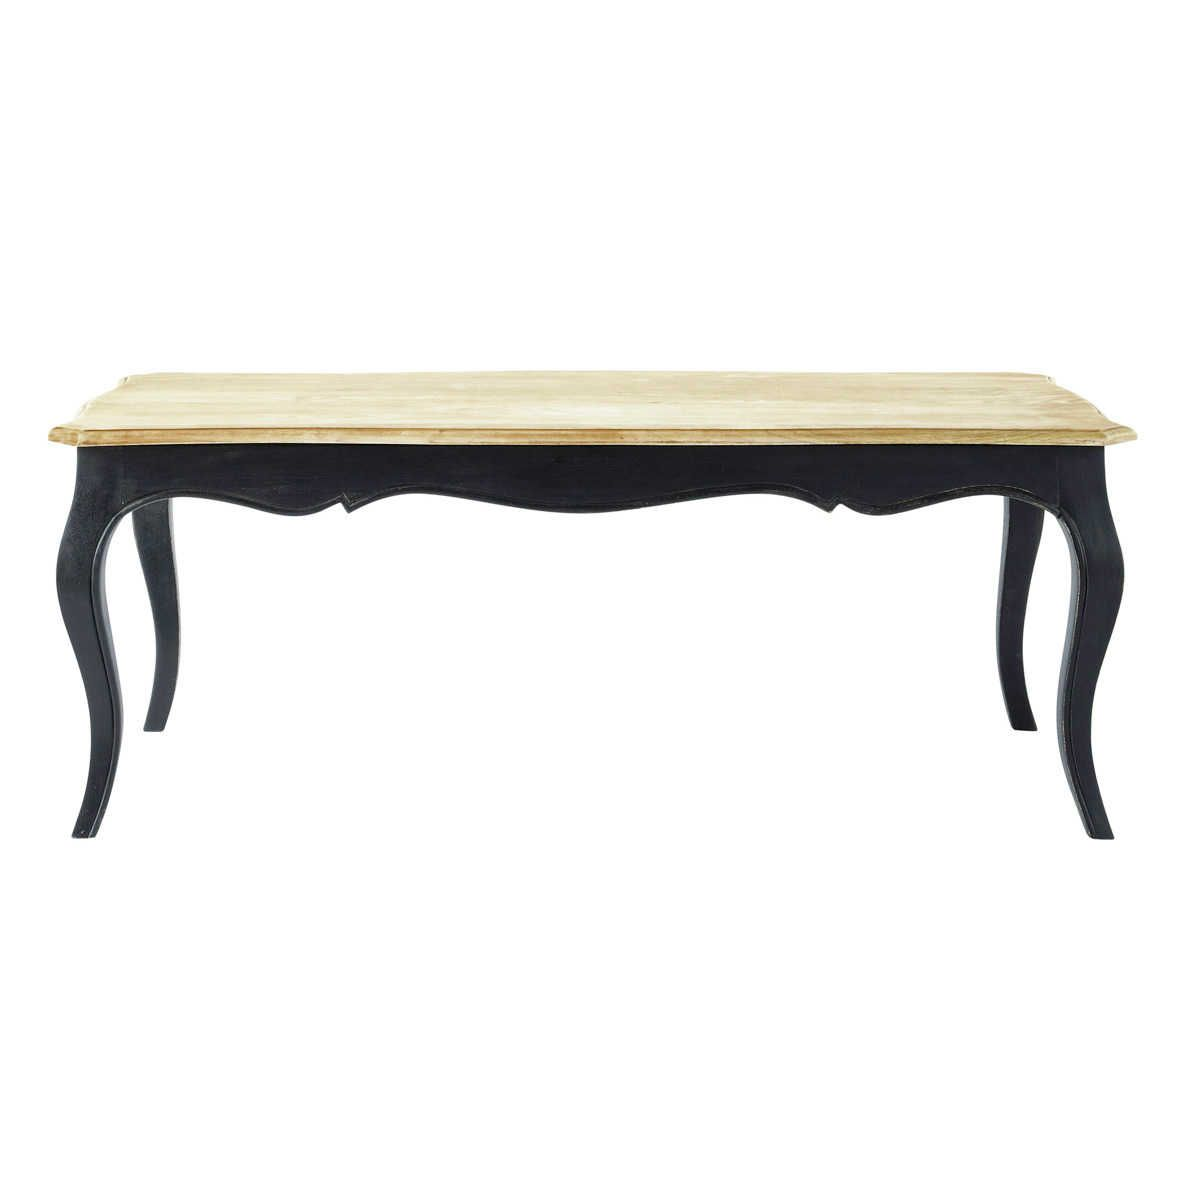 table basse noire classique versailles d co mix and match style colonial pinterest table. Black Bedroom Furniture Sets. Home Design Ideas